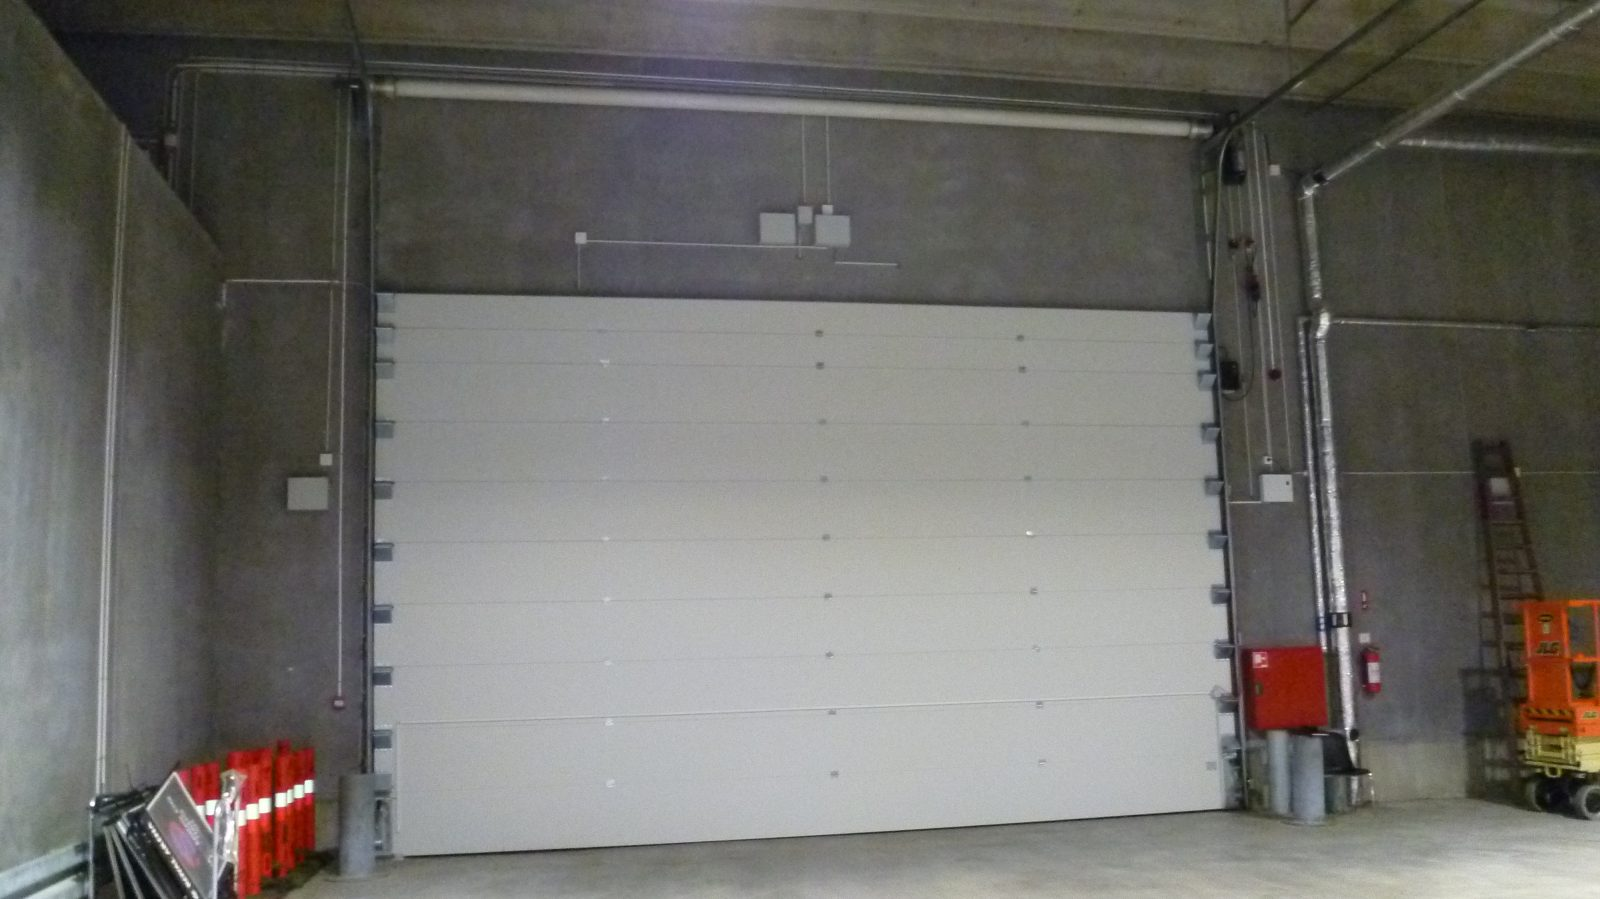 Copenhagen Arena The Royal Arena Acoustics Protec Industrial Doors